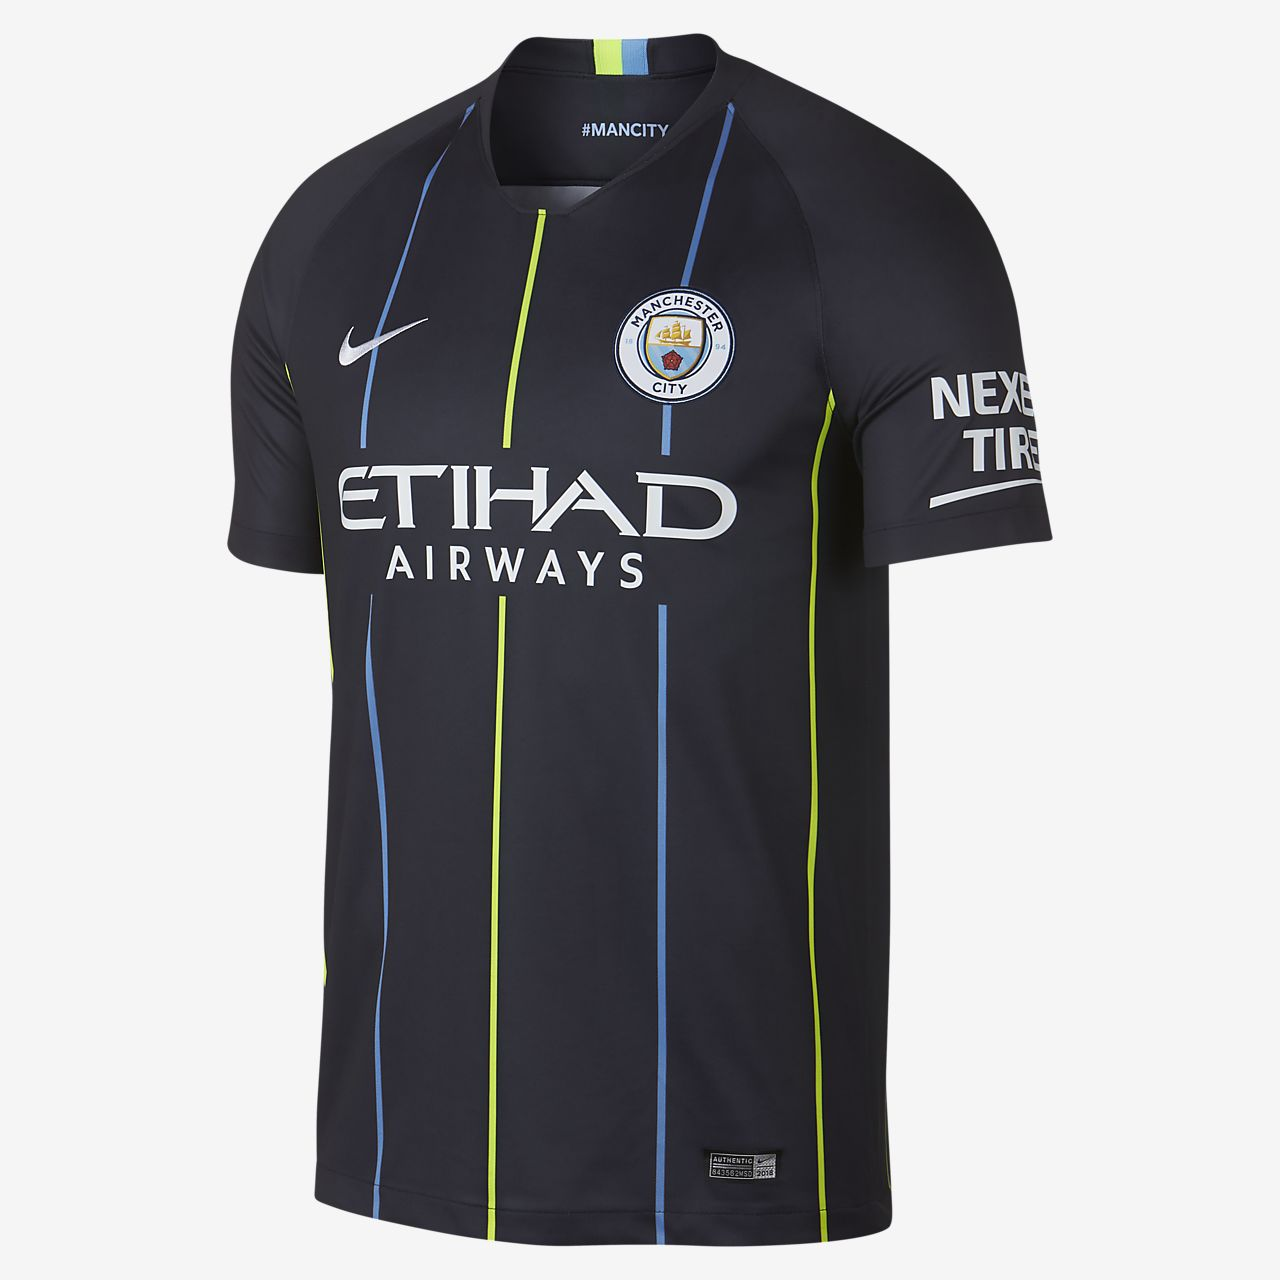 save off f1a86 3b6e3 ... Camiseta de fútbol para hombre de visitante Stadium del Manchester City  FC 2018 19